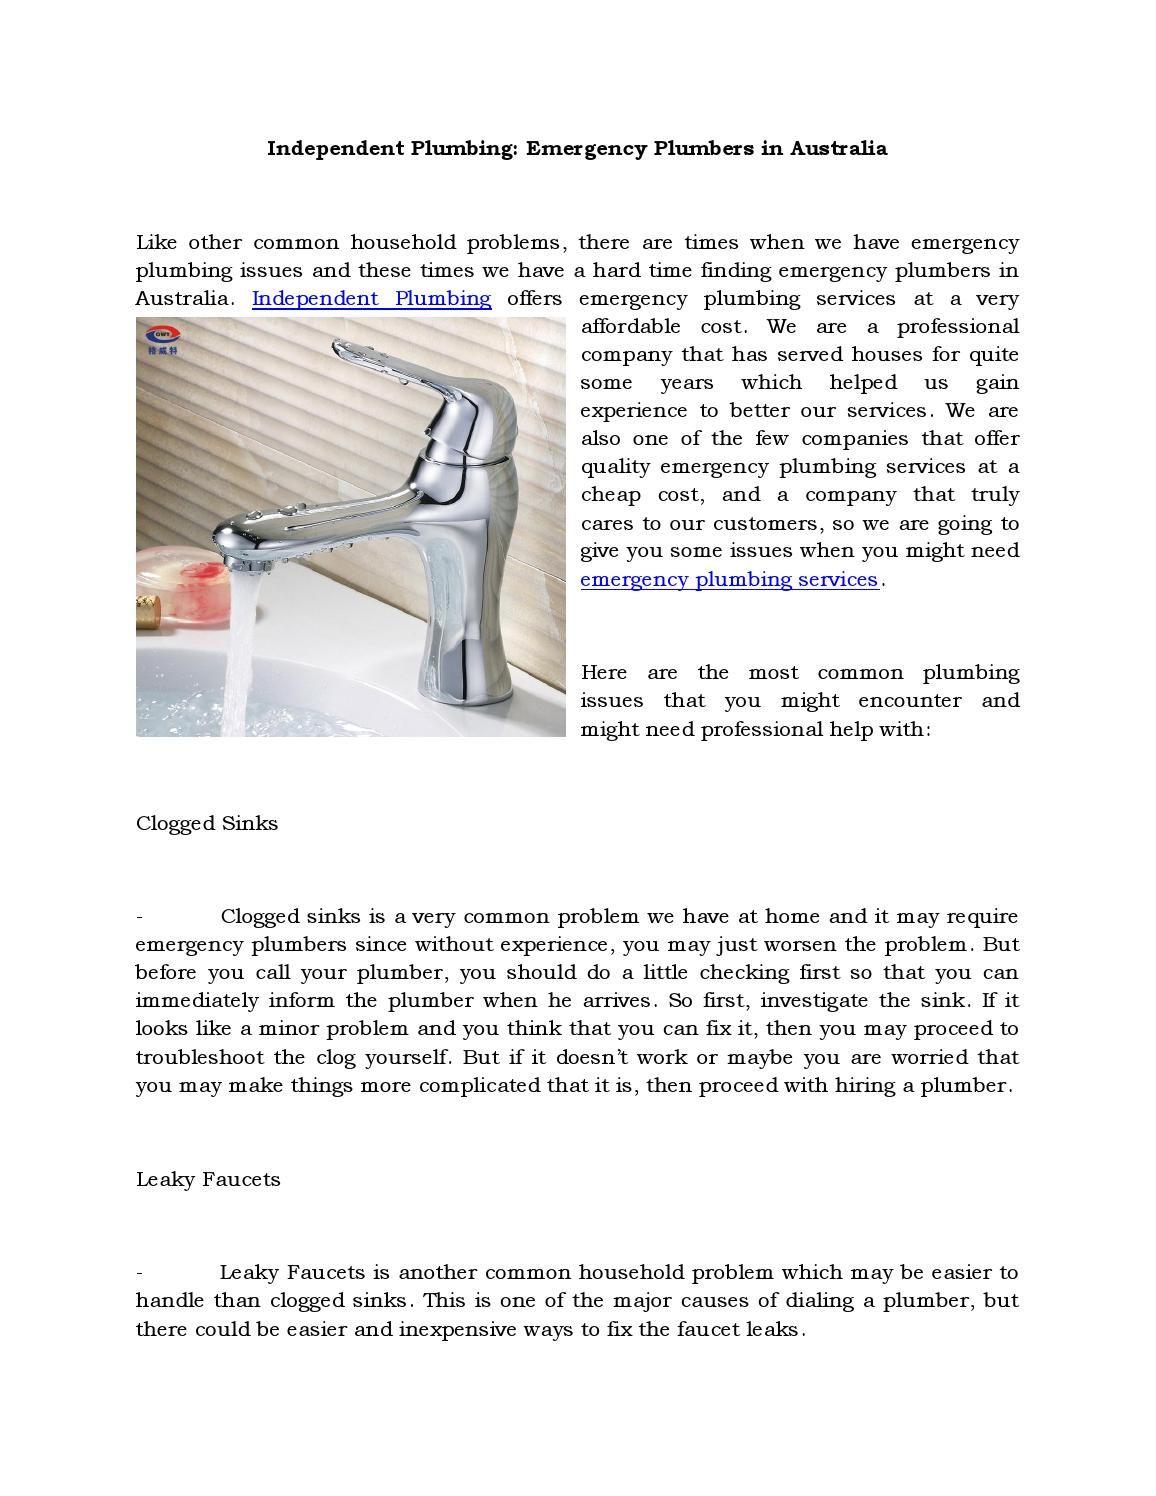 Independent Plumbing Emergency Plumbers in Australia